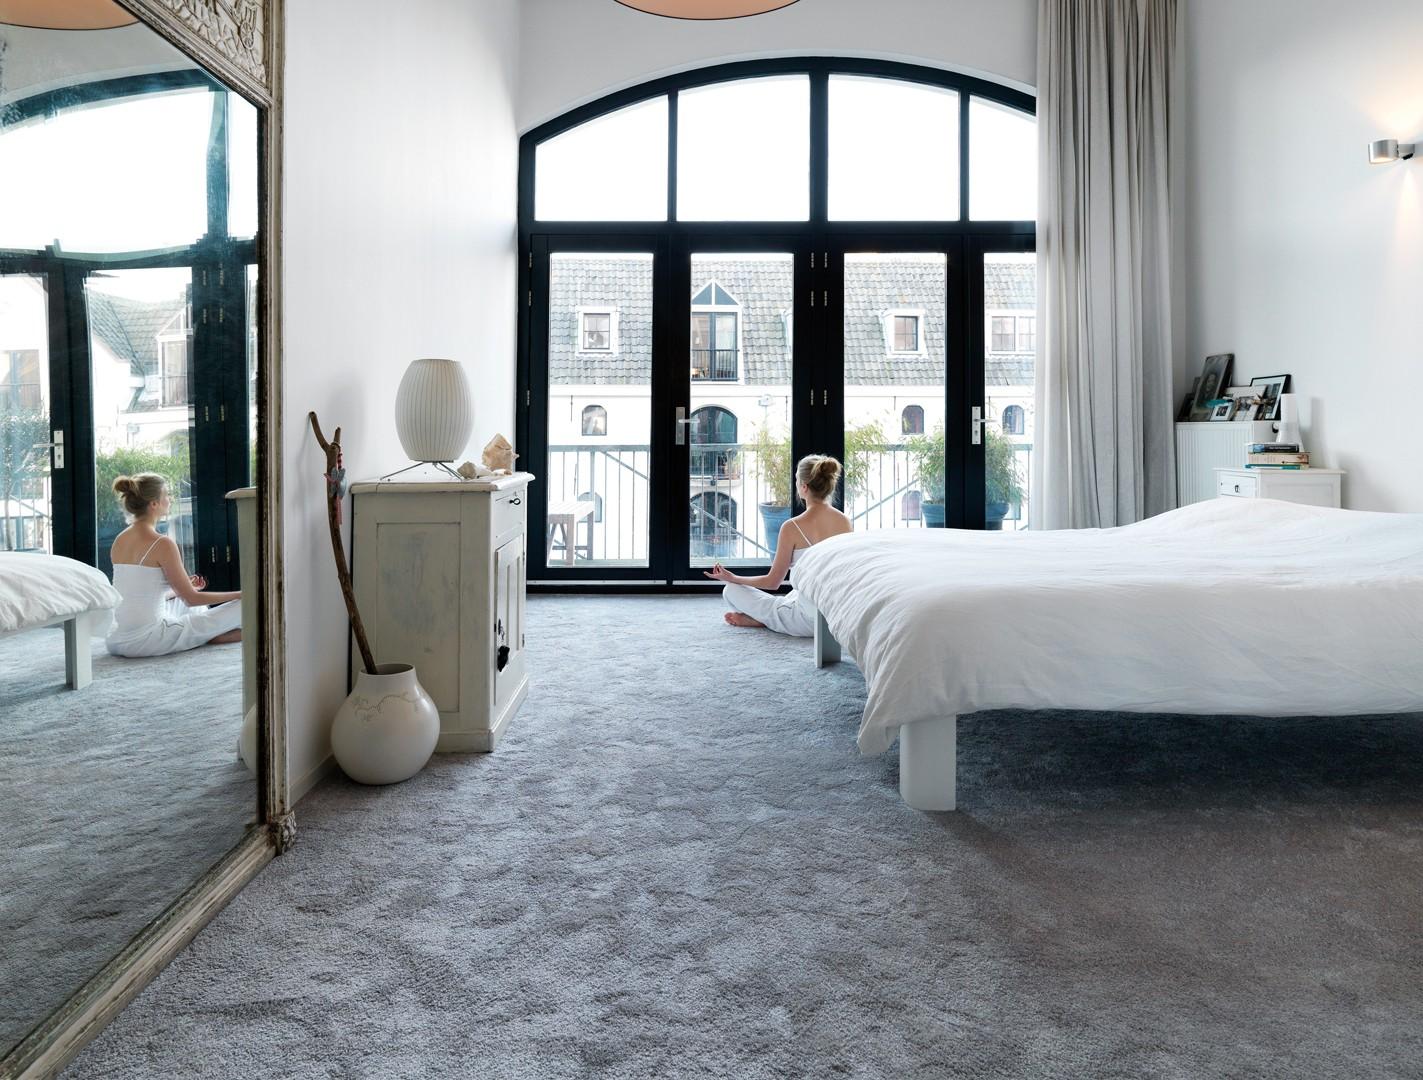 http://thomas.gaspersz.nl/wp-content/uploads/2015/12/vloerbedekking-slaapkamer-tapijt.jpg